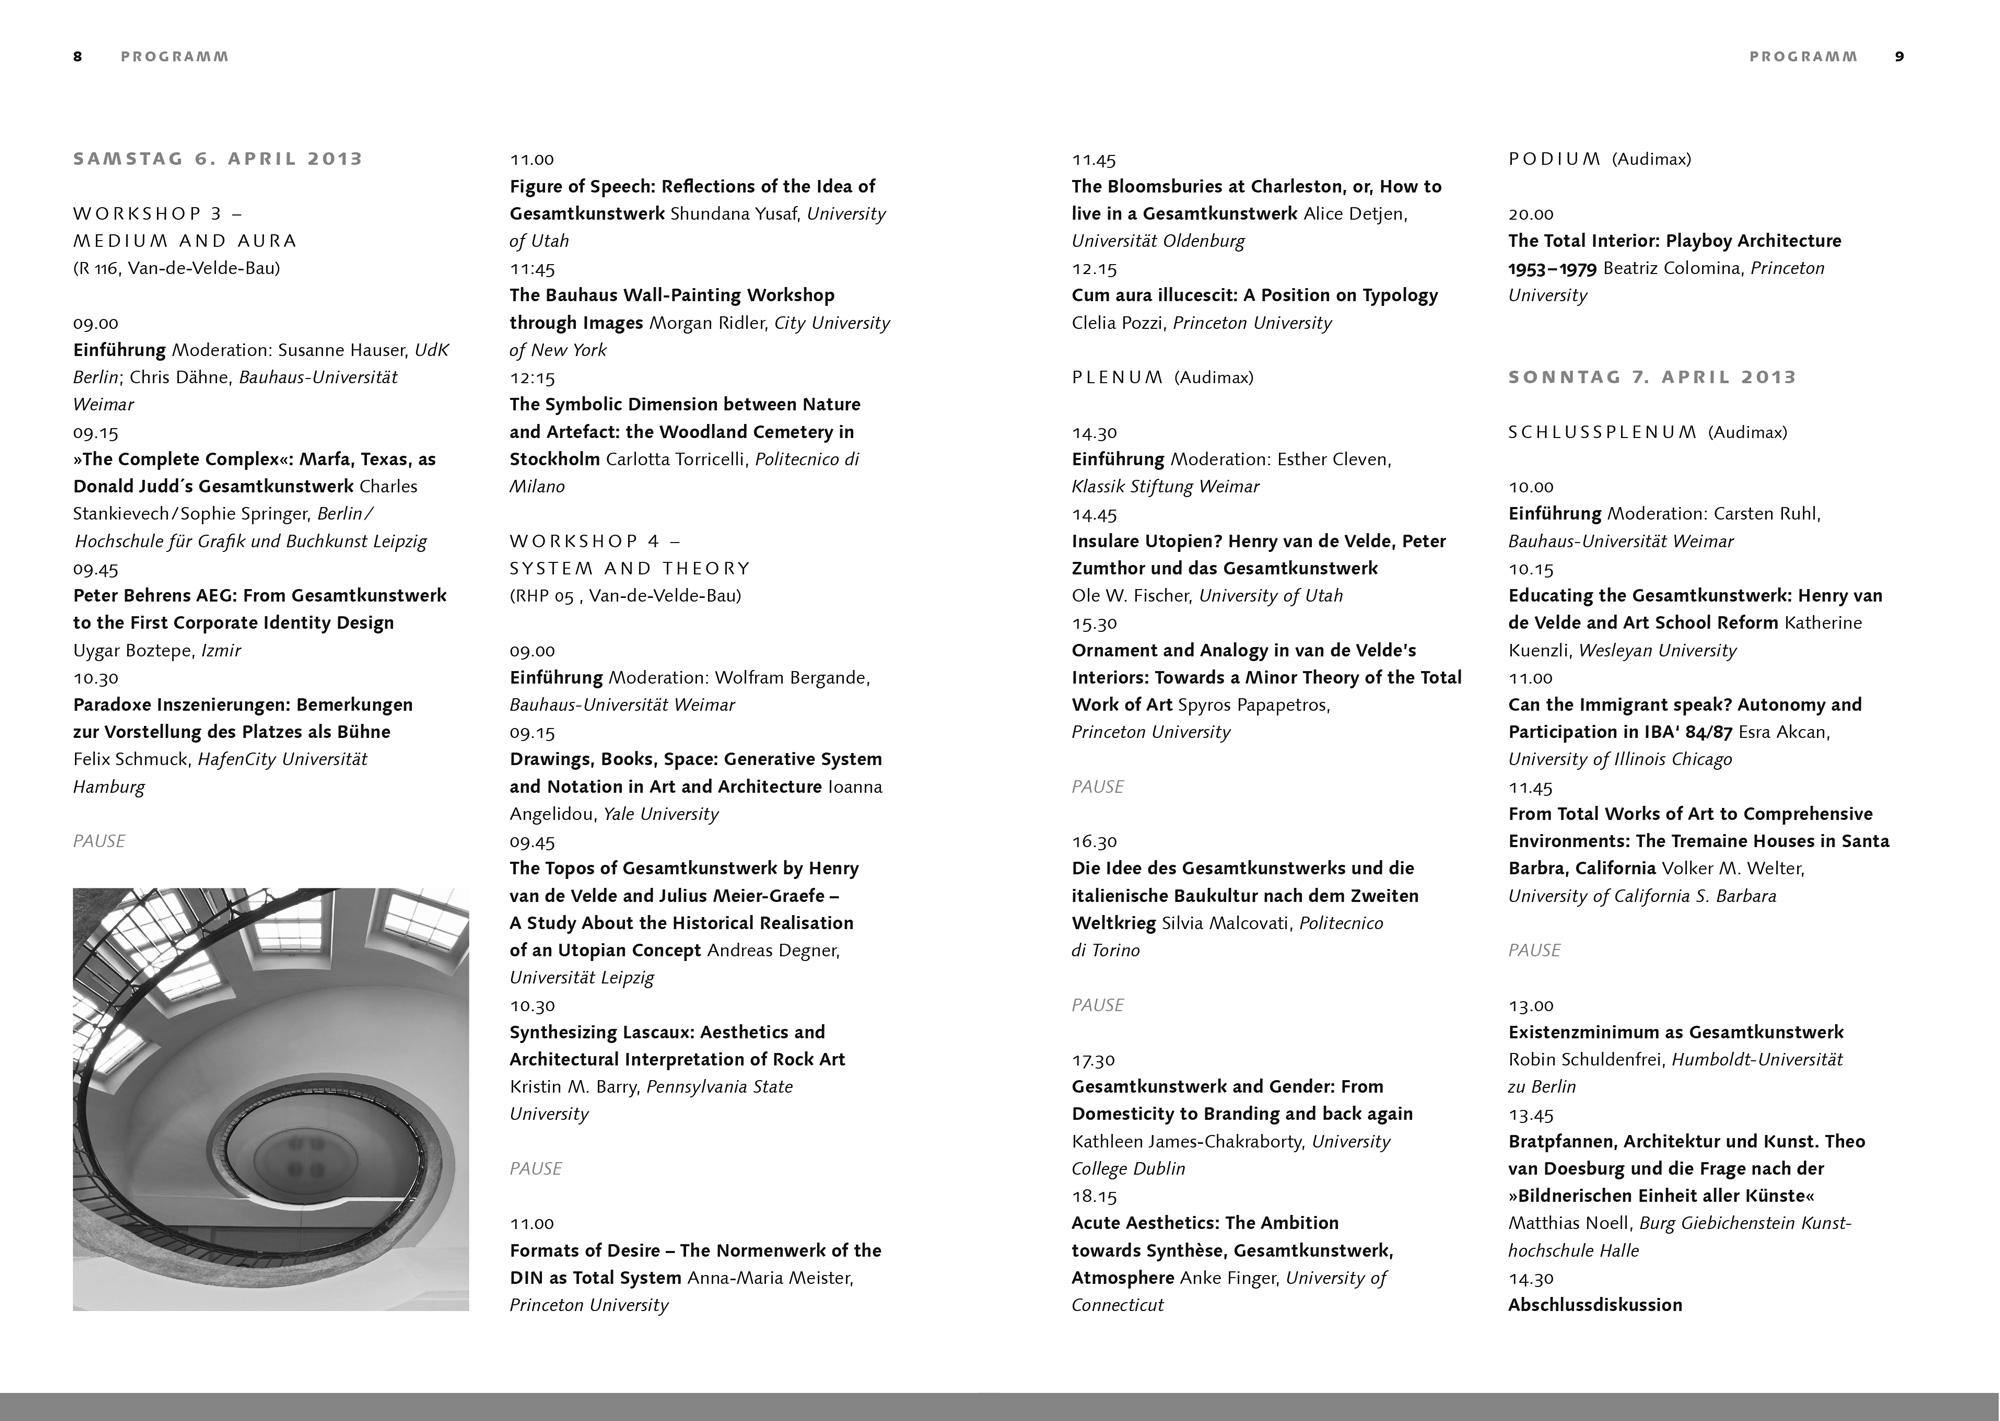 Programm des XII. Bauhaus-Kolloquiums